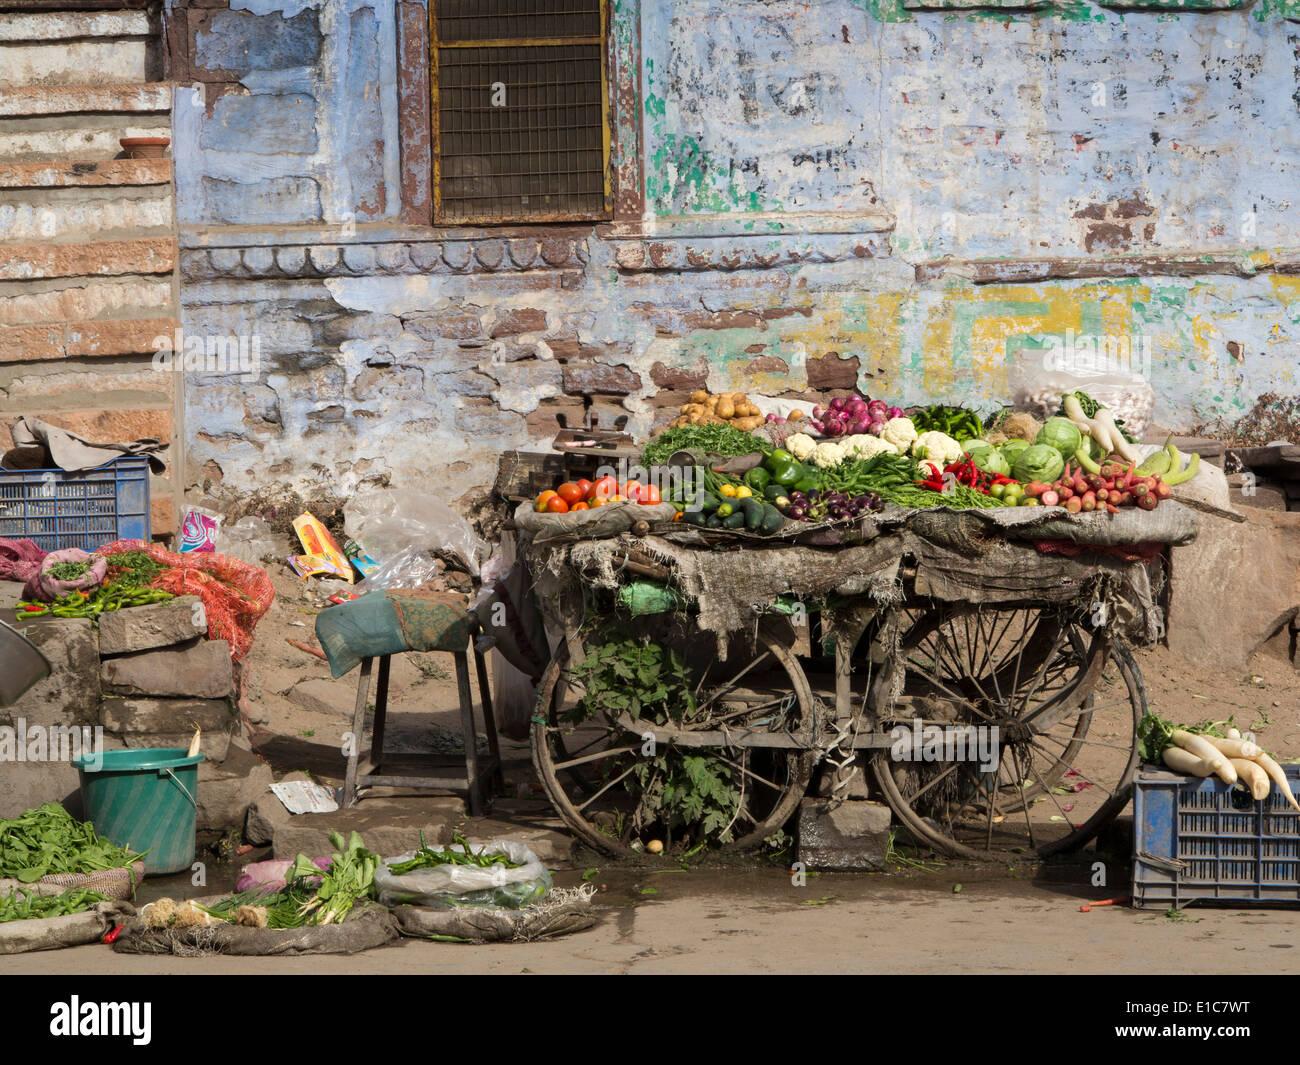 India, Rajasthan, Jodhpur, Brahmpuri, unhygienic roadside fruit and vegetable stall - Stock Image